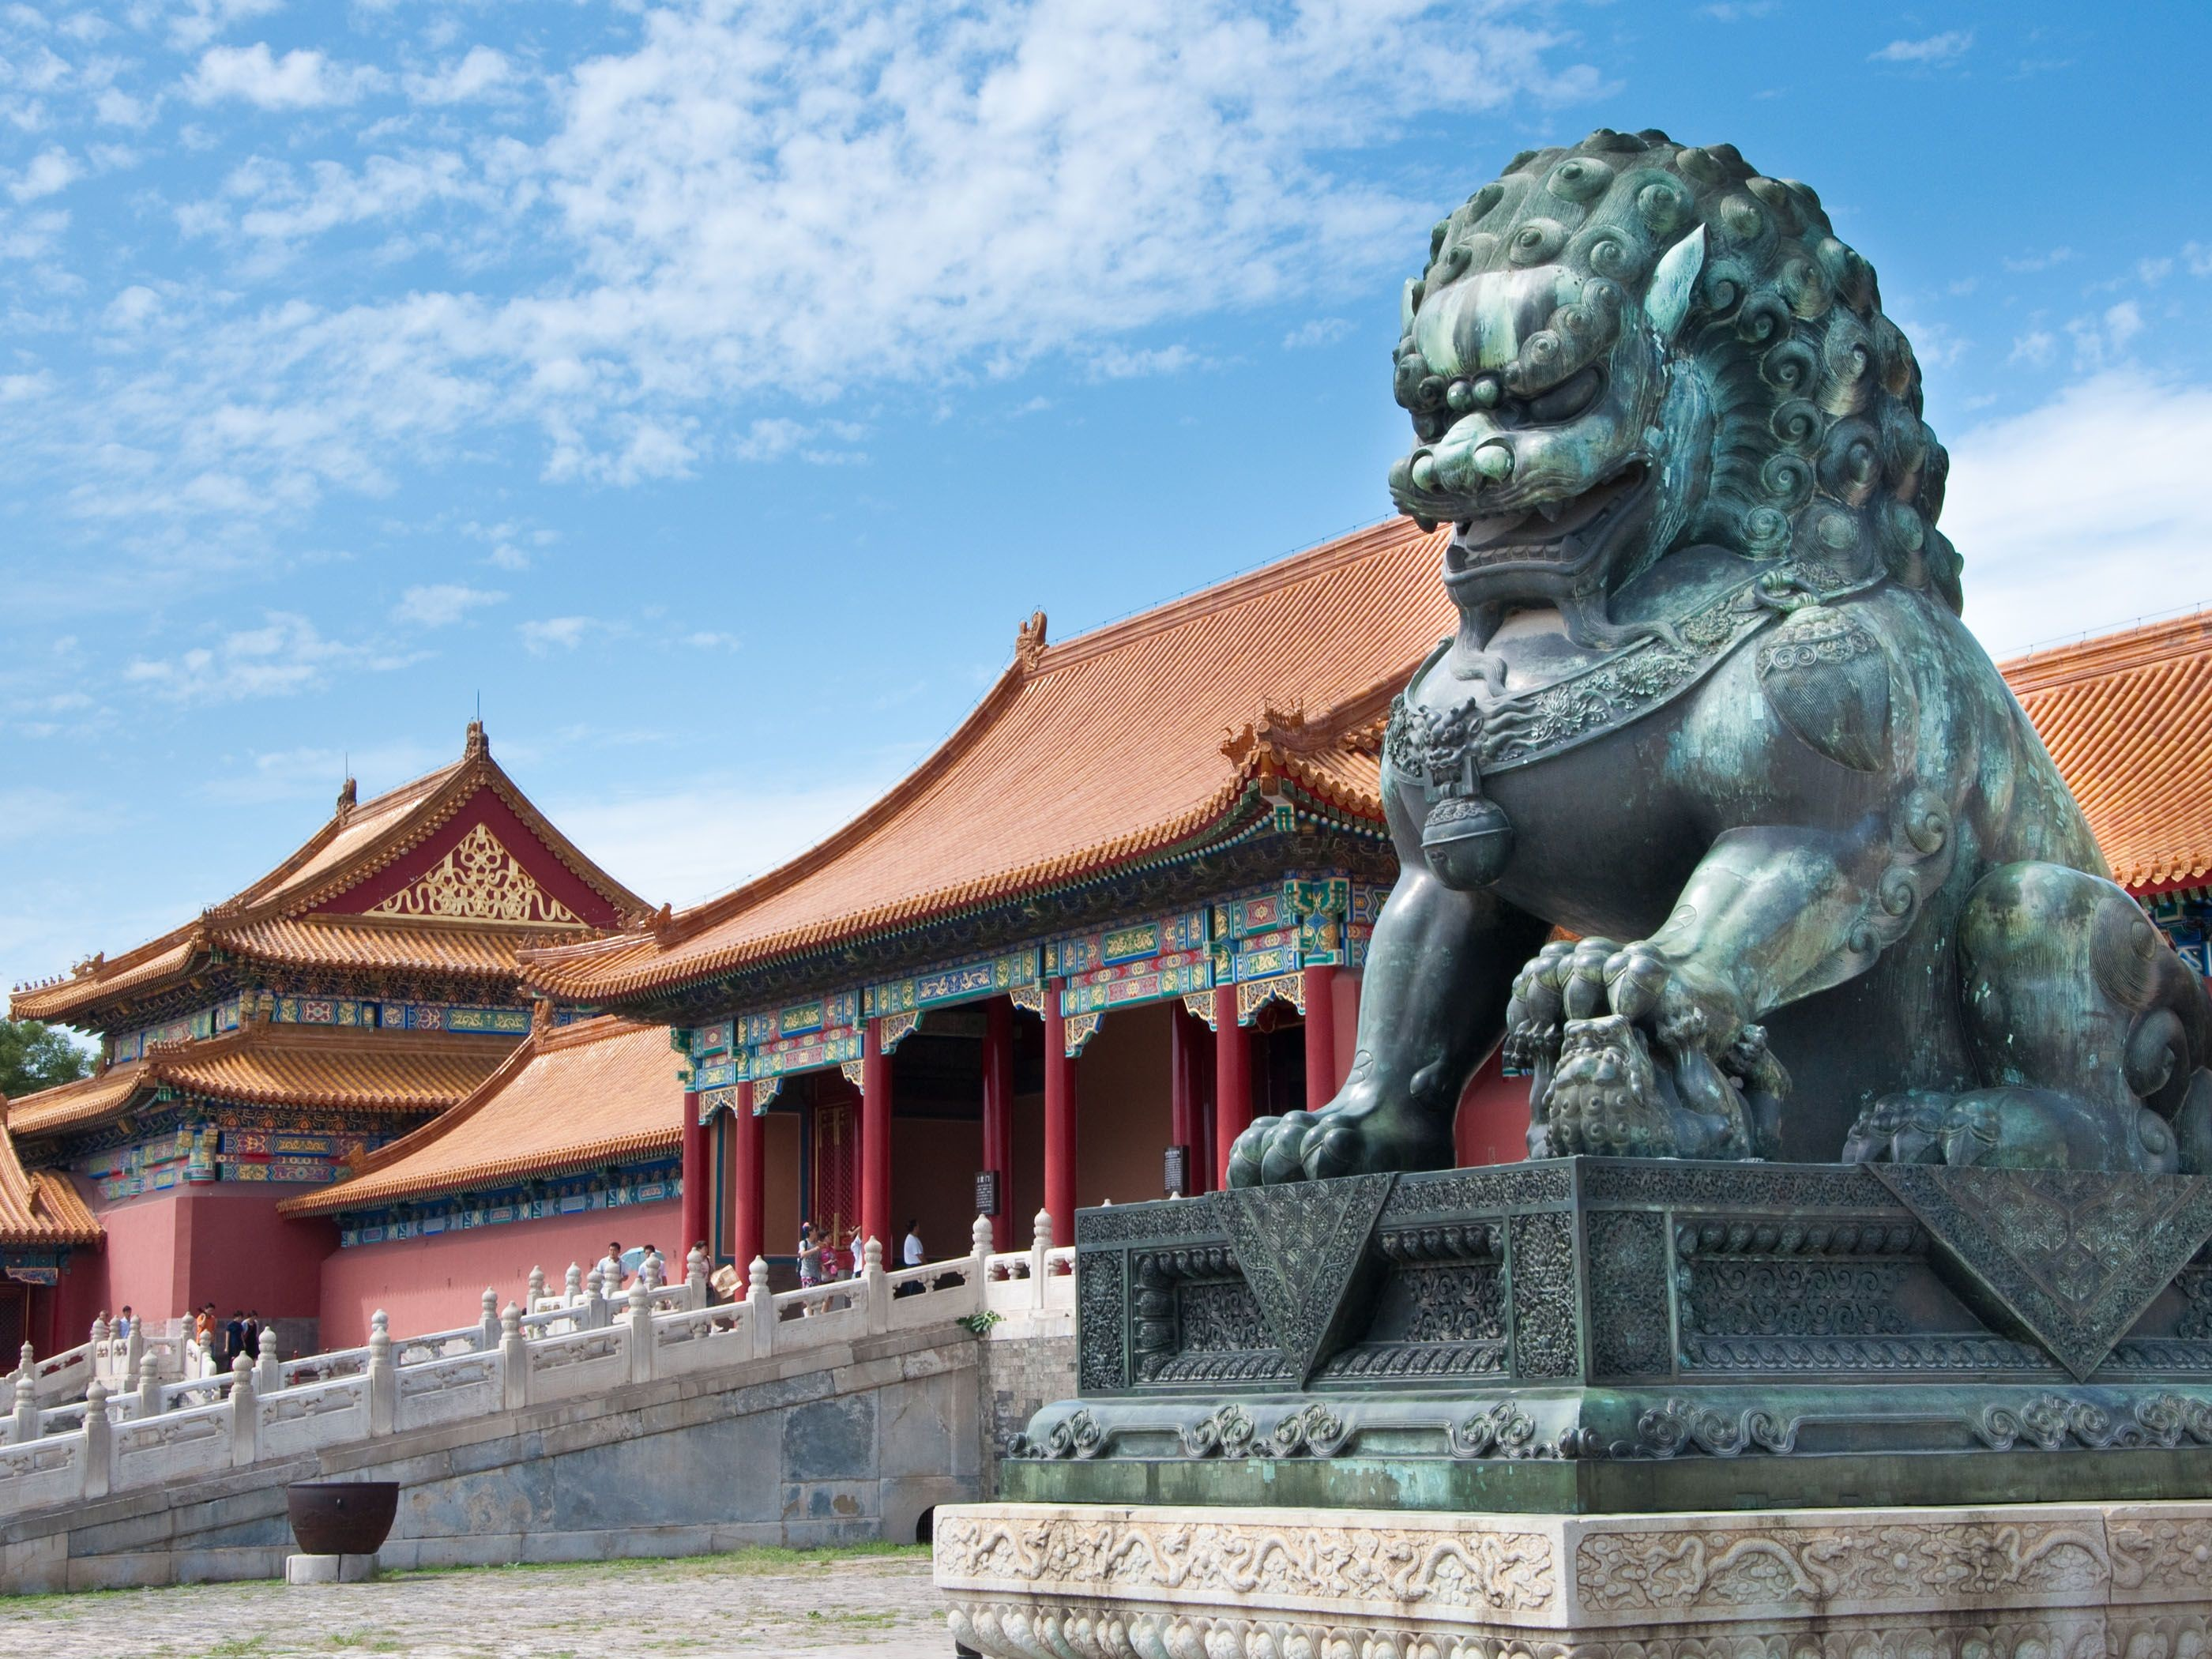 Res: 2800x2100, forbidden city beijing china landscape wallpaper.jpg (2800×2100)